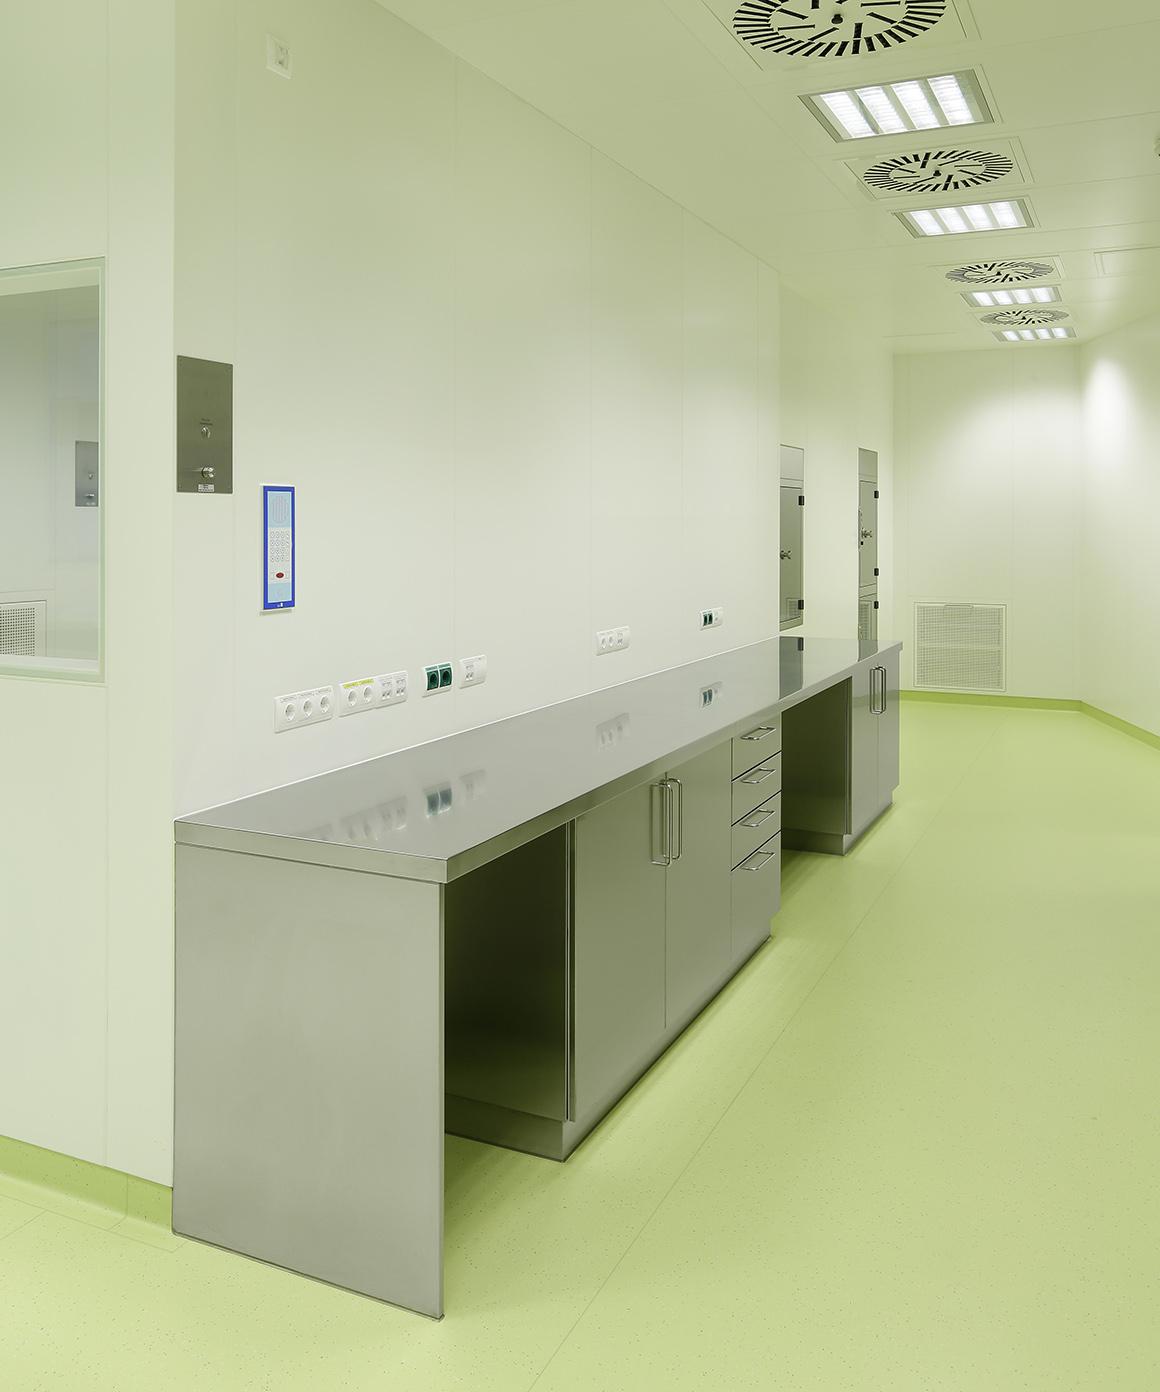 GMP-Edelstahlmöbel von Kiefer technic